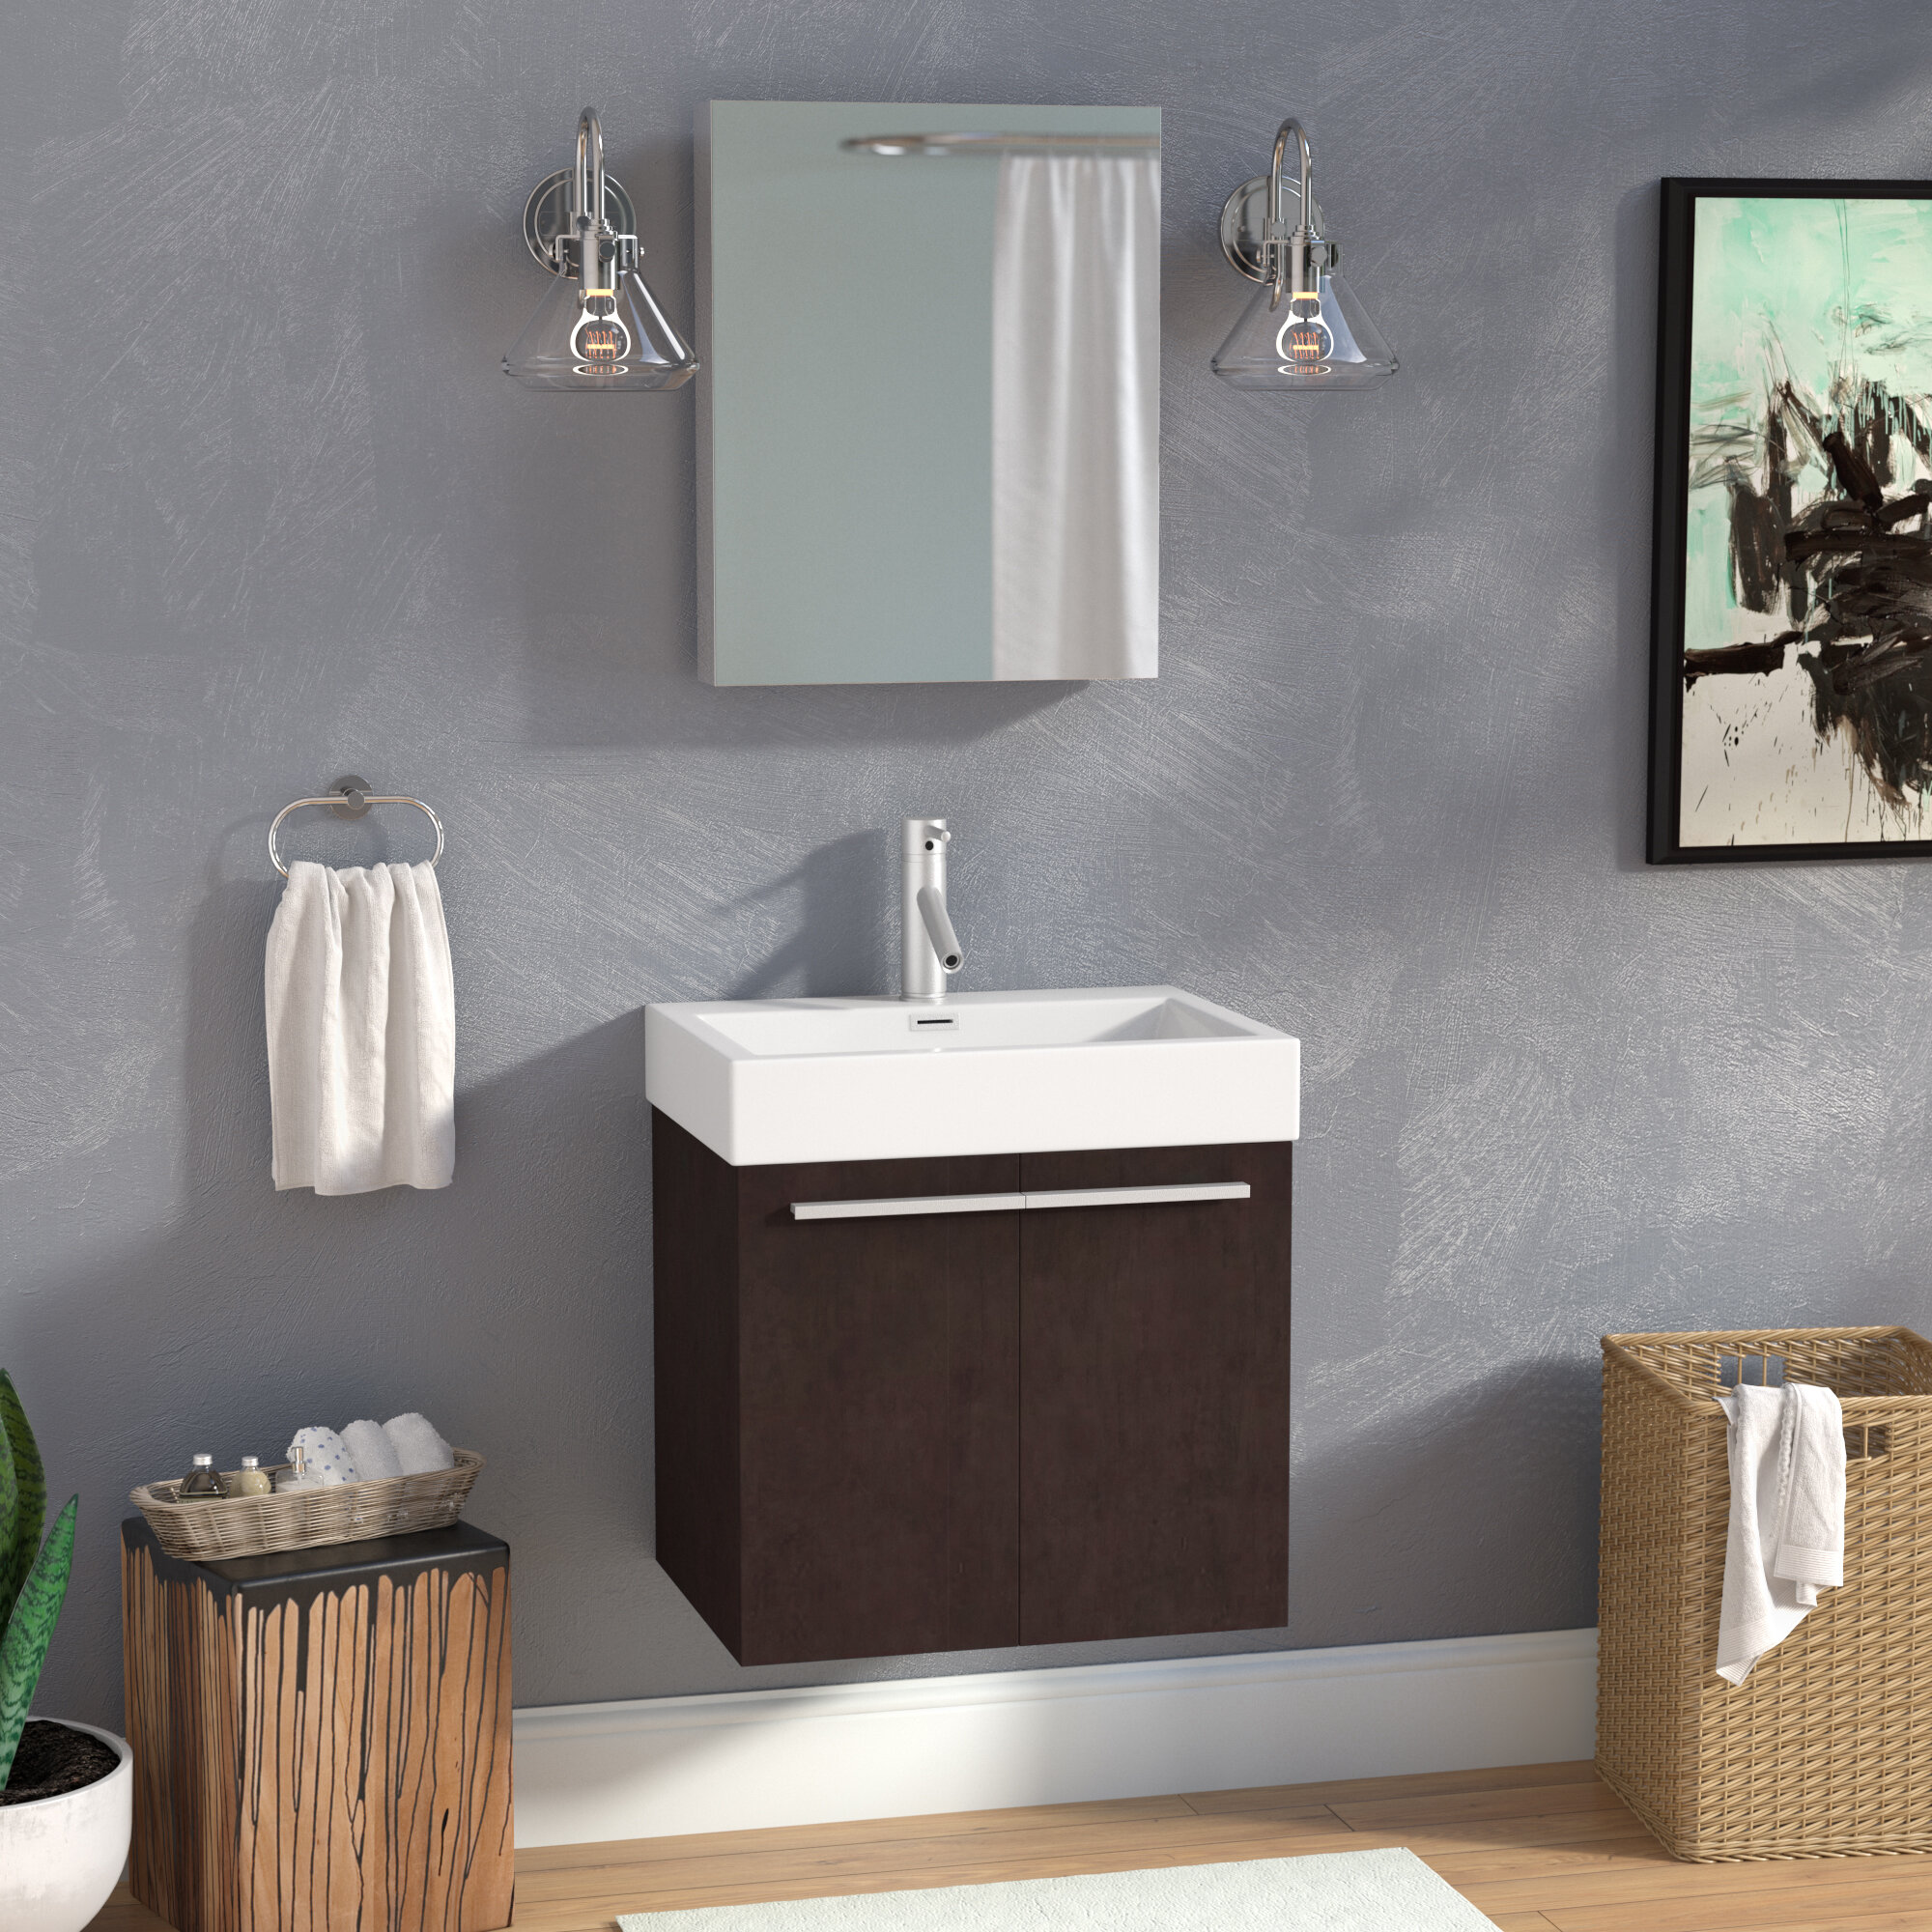 Brayden Studio Frausto 23 Wall Mounted Single Bathroom Vanity Set